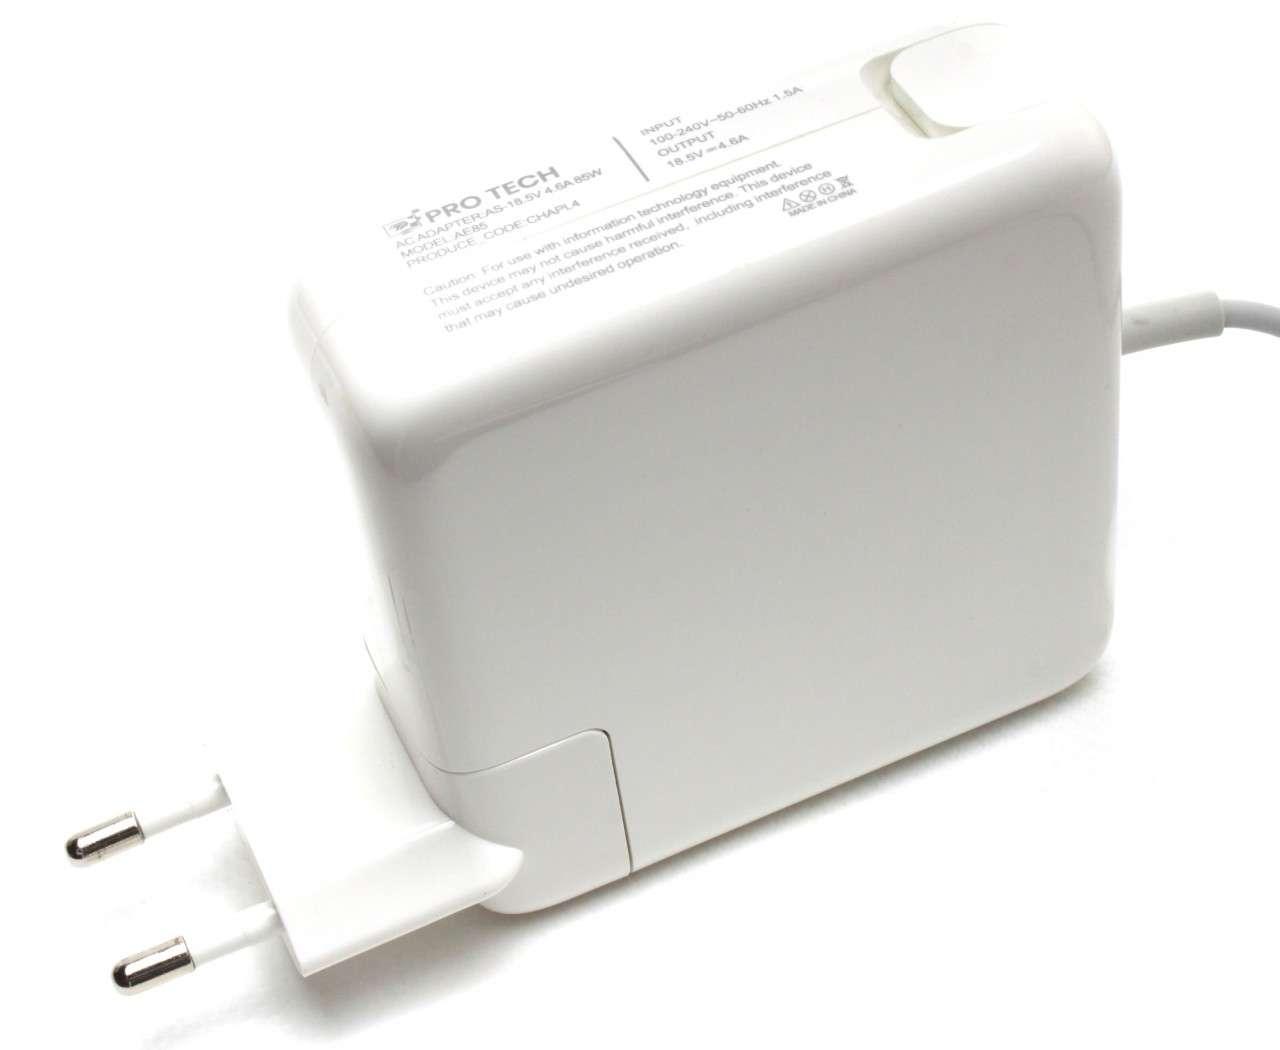 Incarcator Apple MacBook Pro 17 inch Mid 2009 85W Replacement imagine